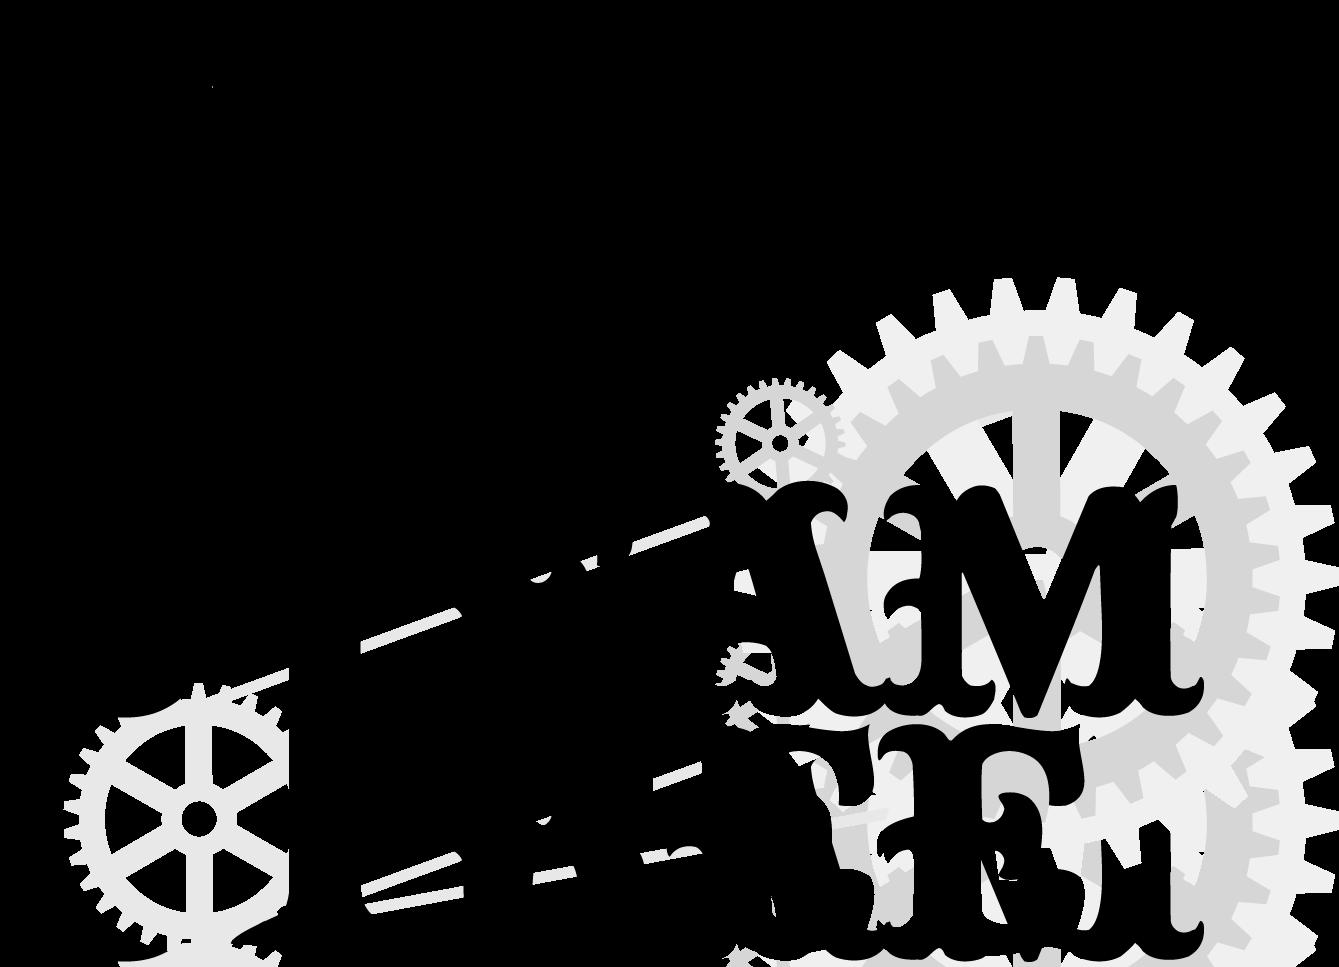 steamtree-logo_2_bw